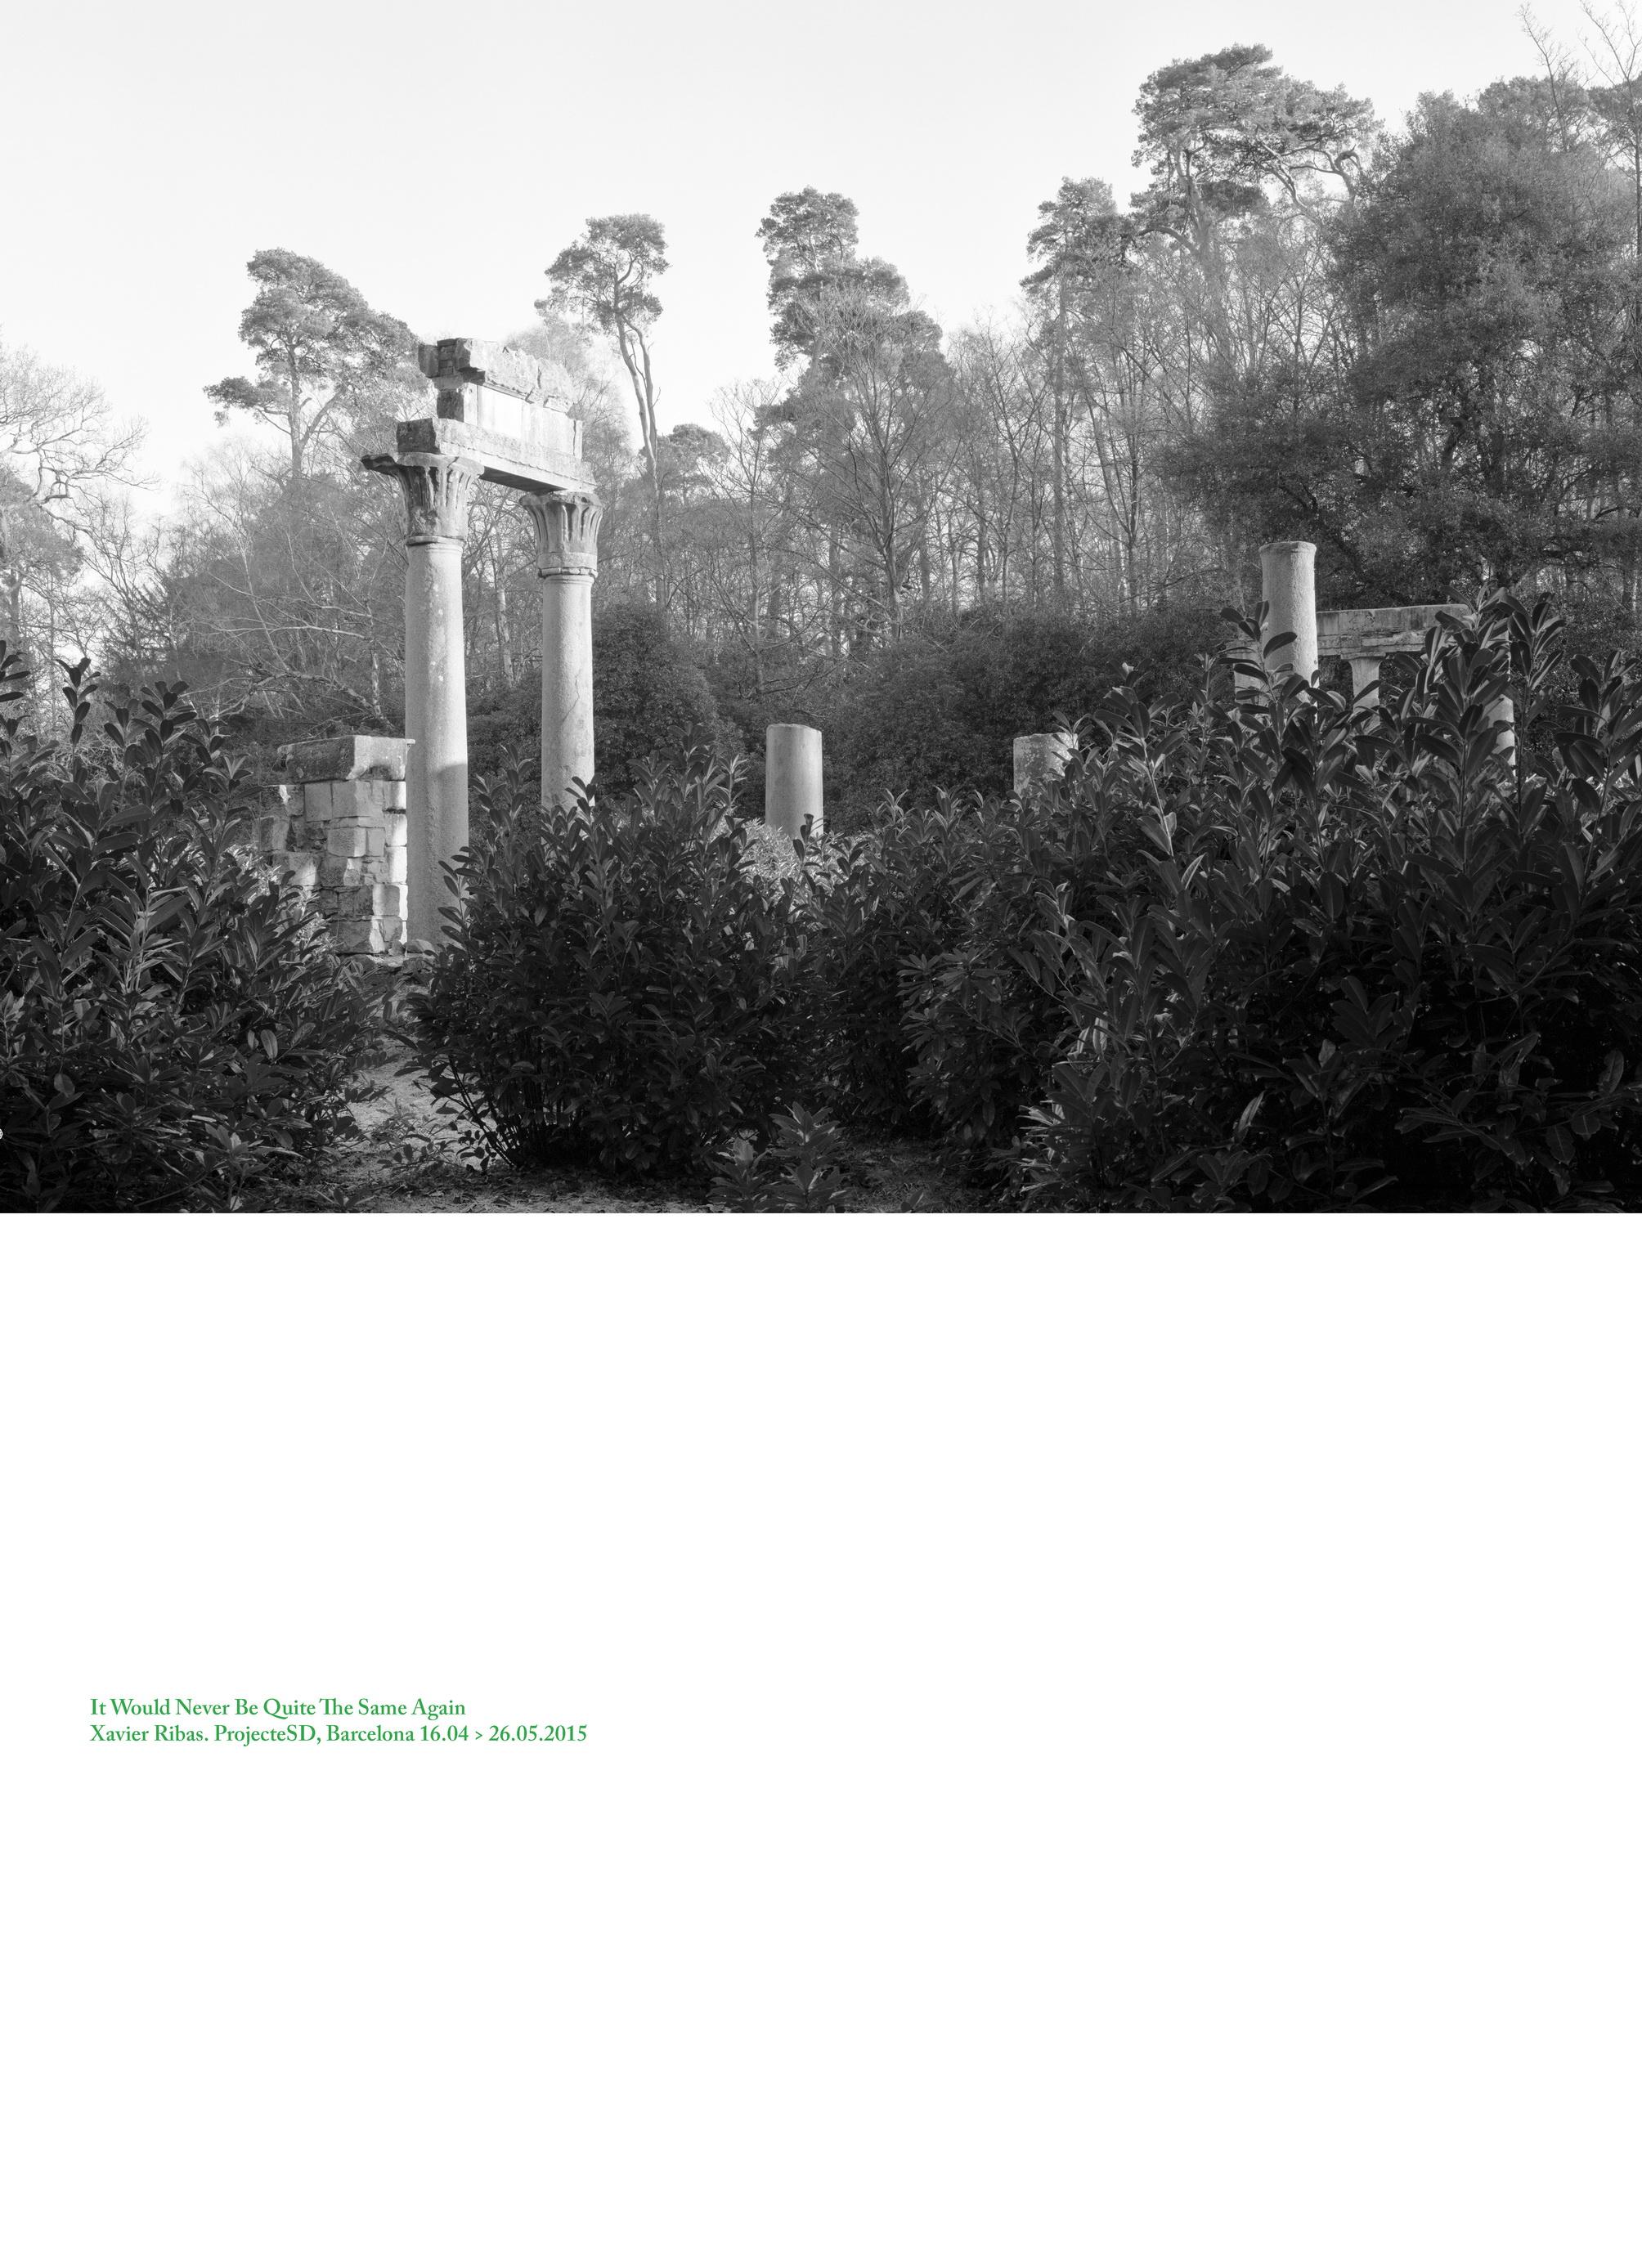 | Poster 03-PSD | ProjecteSD